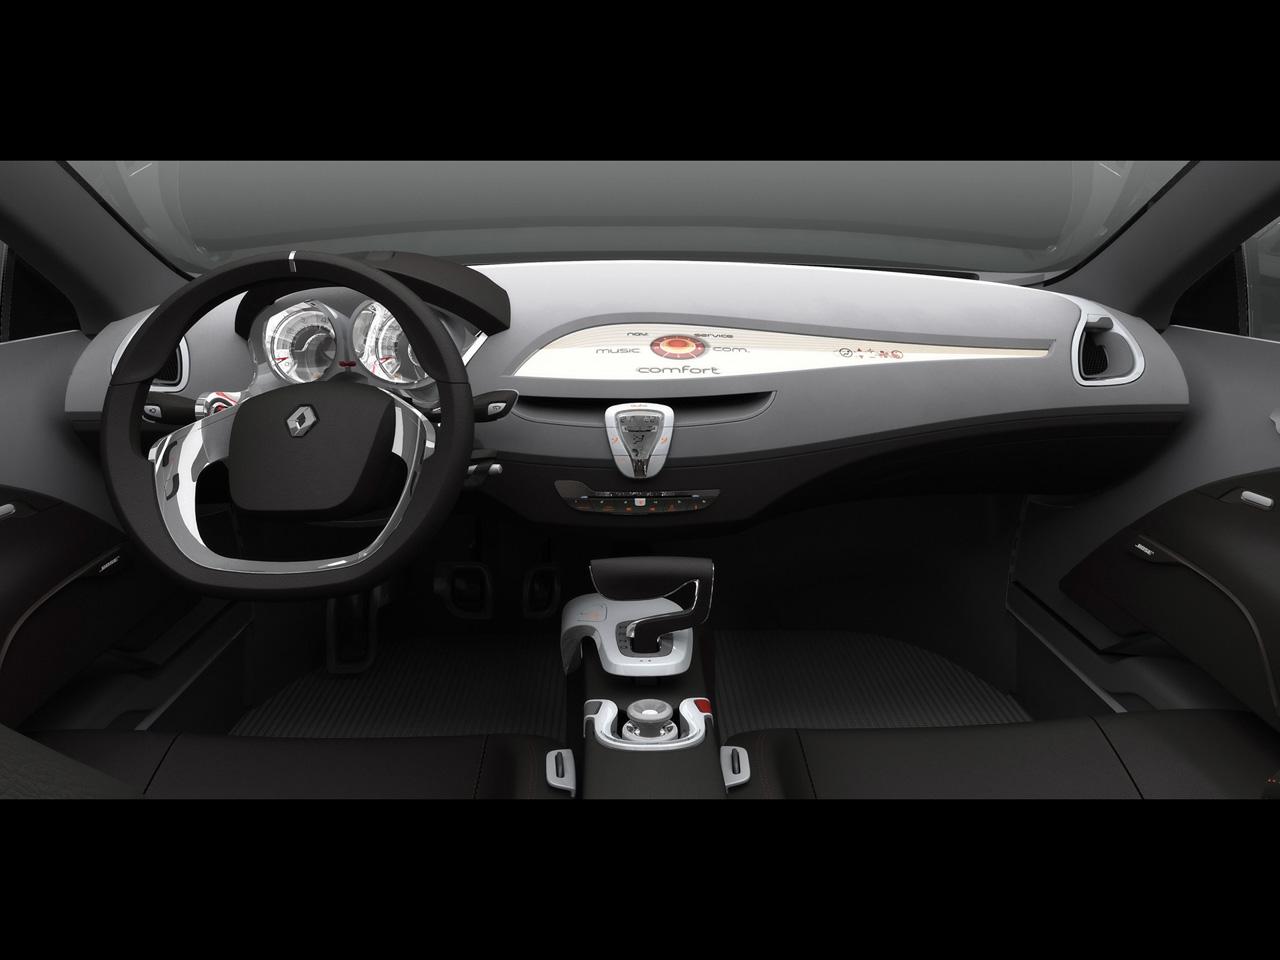 Renault Laguna Sport Tourer 2.0 16v (2007)